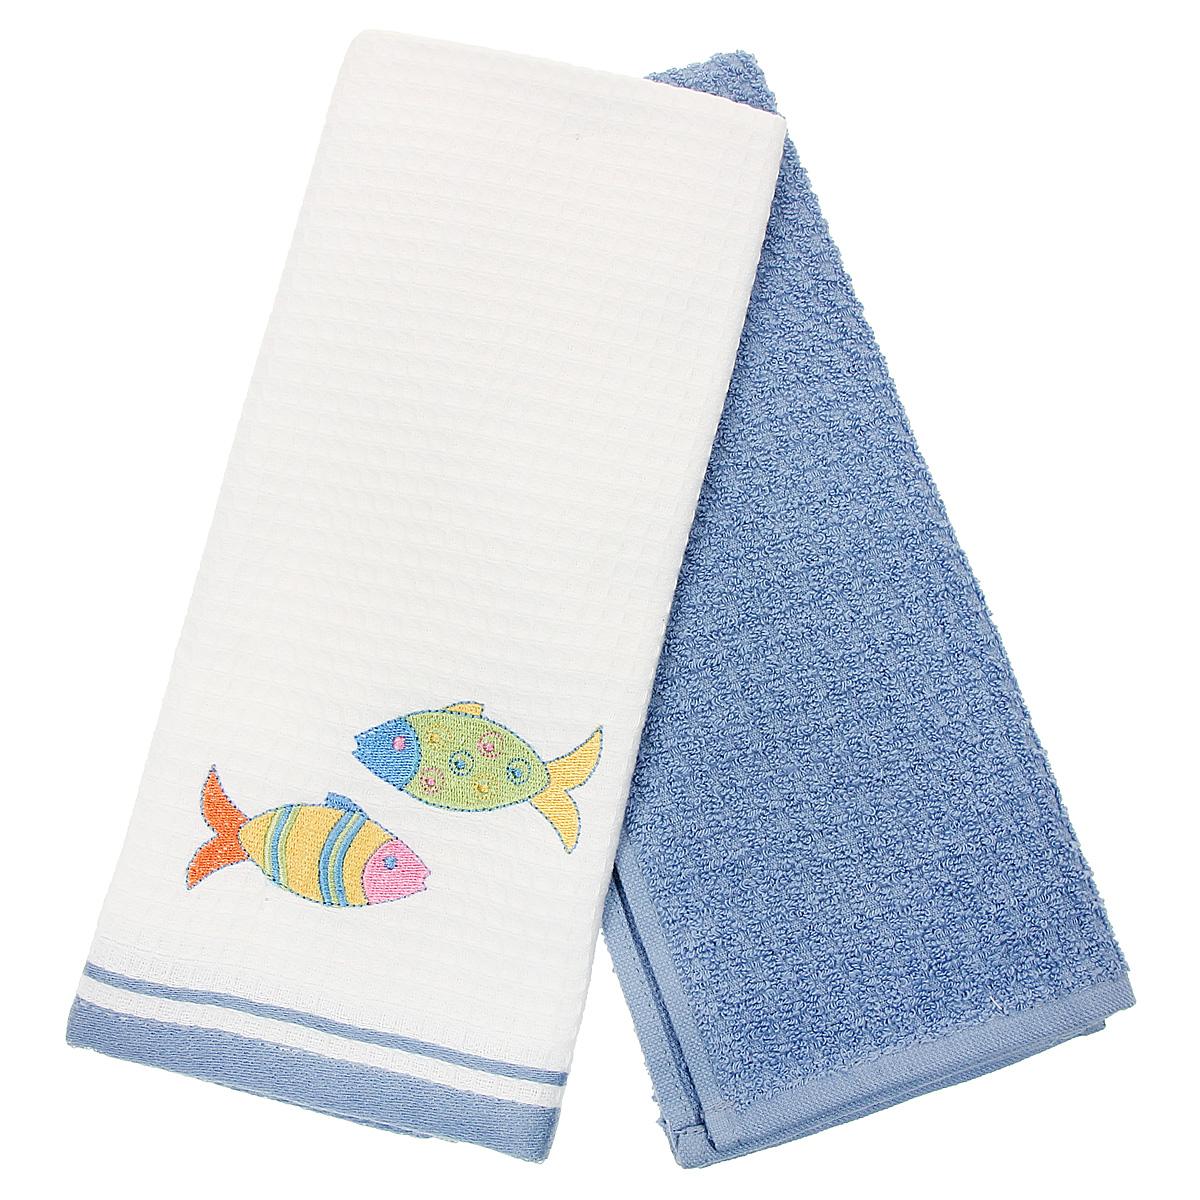 Набор кухонных полотенец Coronet Рыбки, цвет: белый, синий, 40 см х 60 см, 2 штК-МП-5010-05-03-02